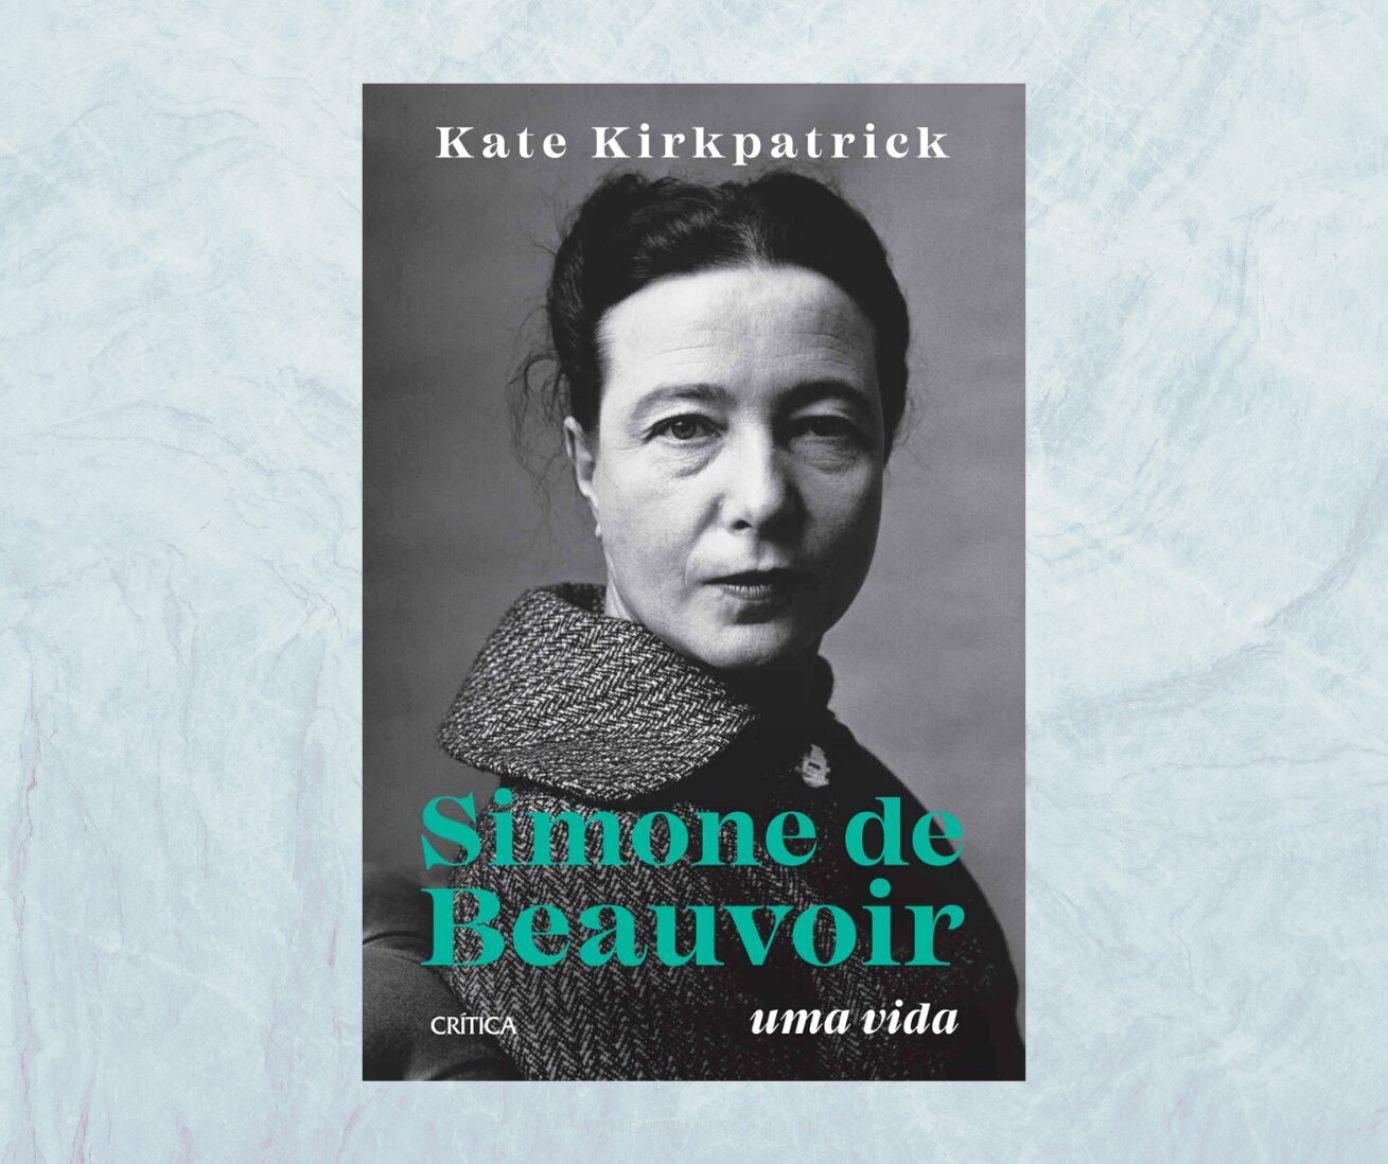 Resenha: Simone de Beauvoir, uma vida, de Kate Kirkpatrick